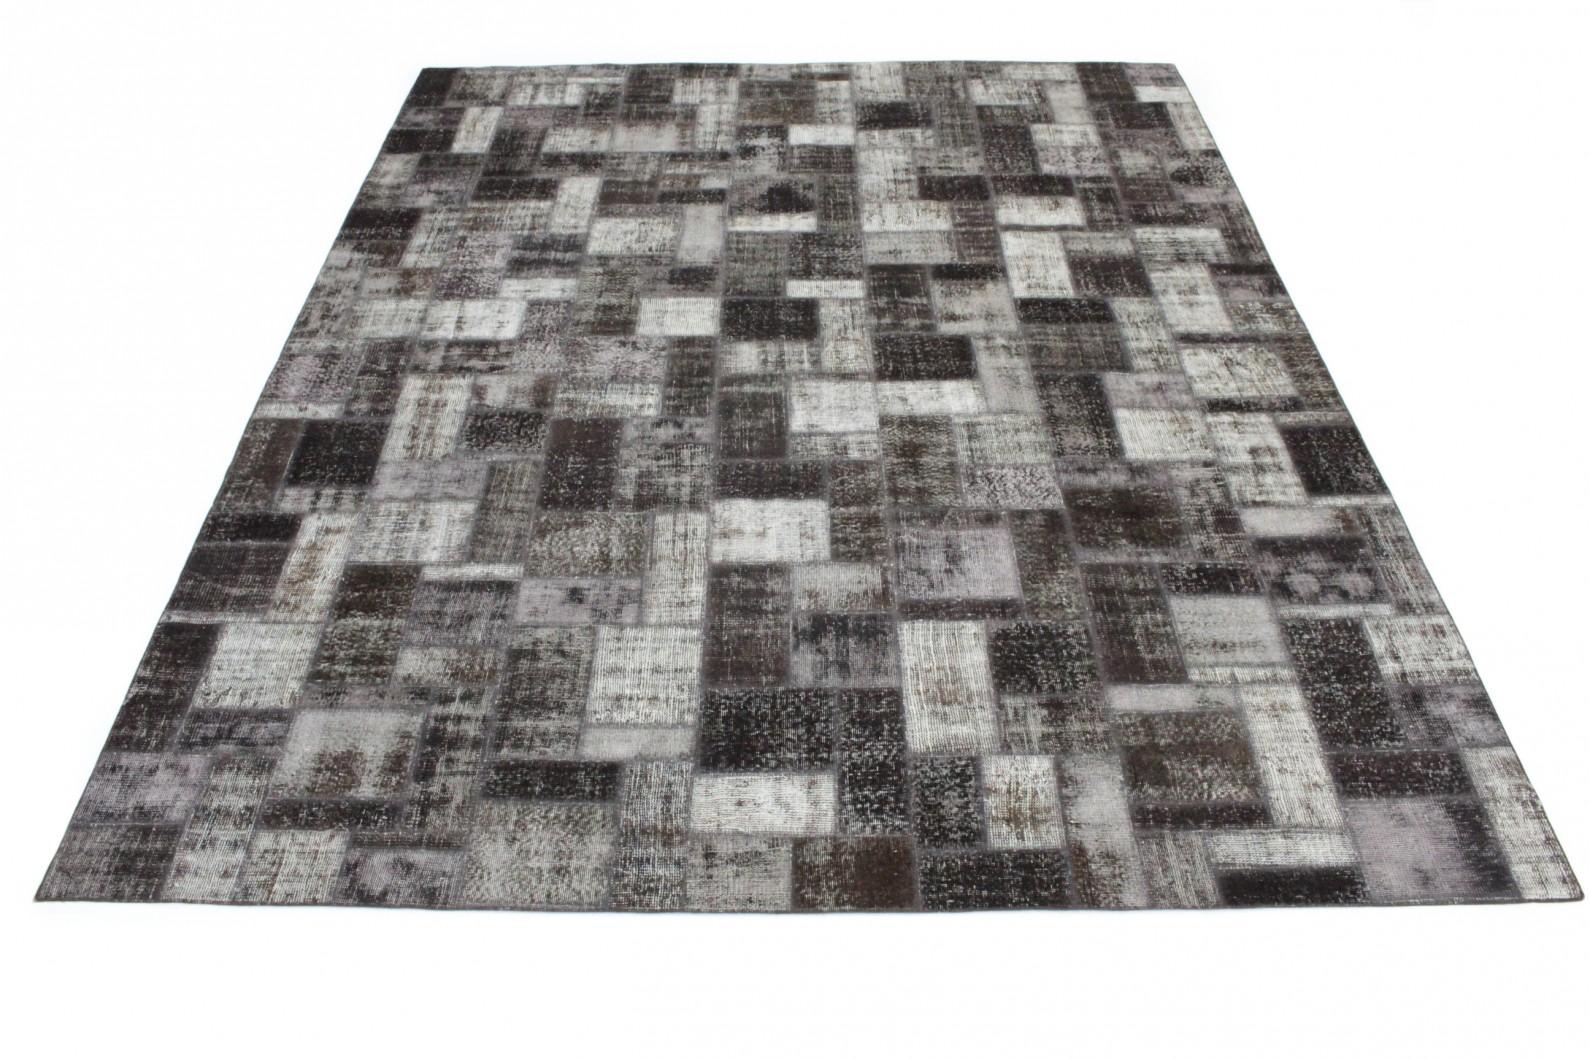 Patchwork Teppich Grau Schwarz in 400x310 (1 / 6)